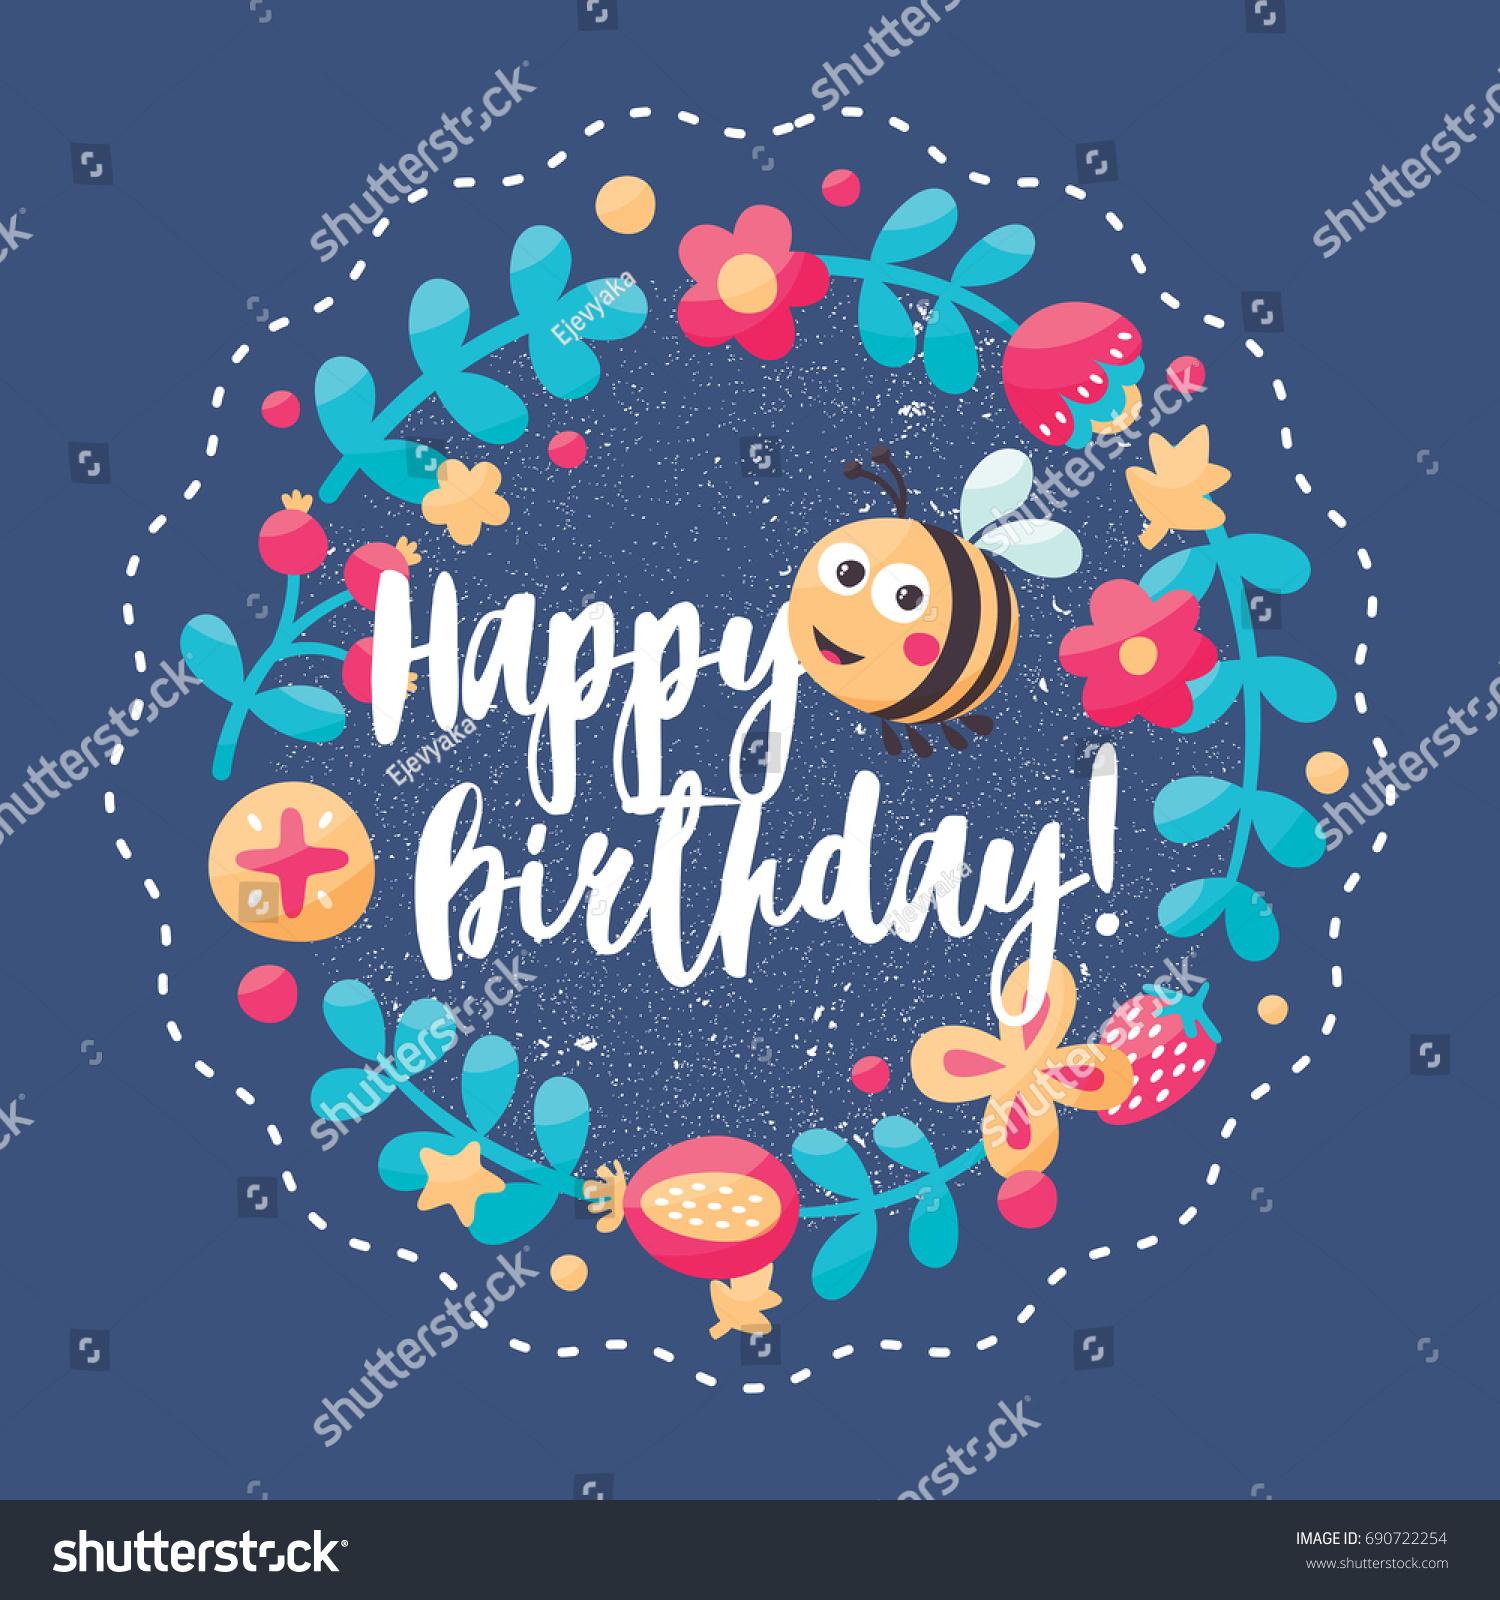 Cute Nature Postcard Happy Birthday Bee Stock Vector Royalty Free 690722254